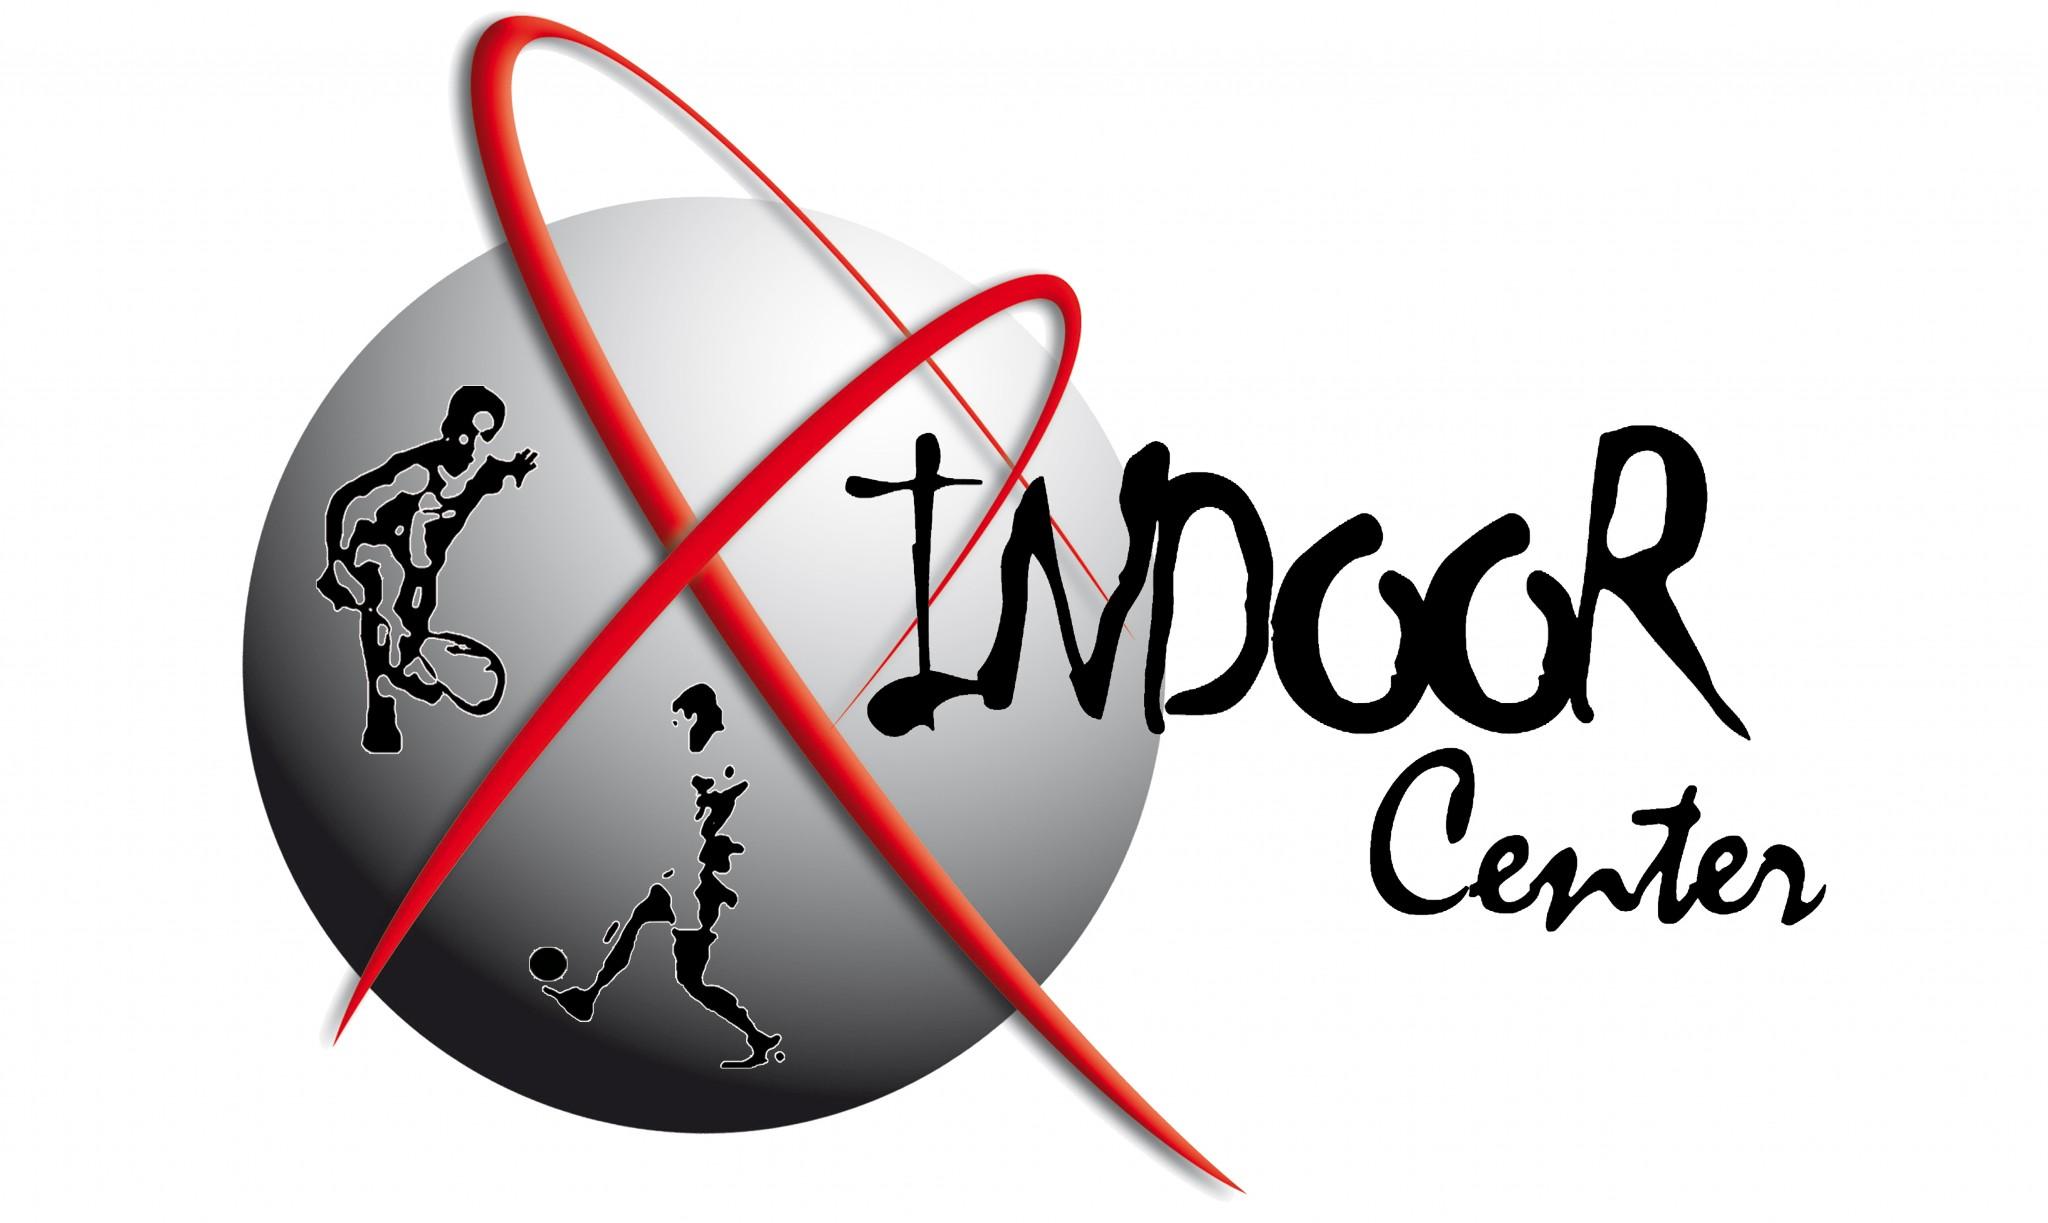 logo centrum halowe narbonne